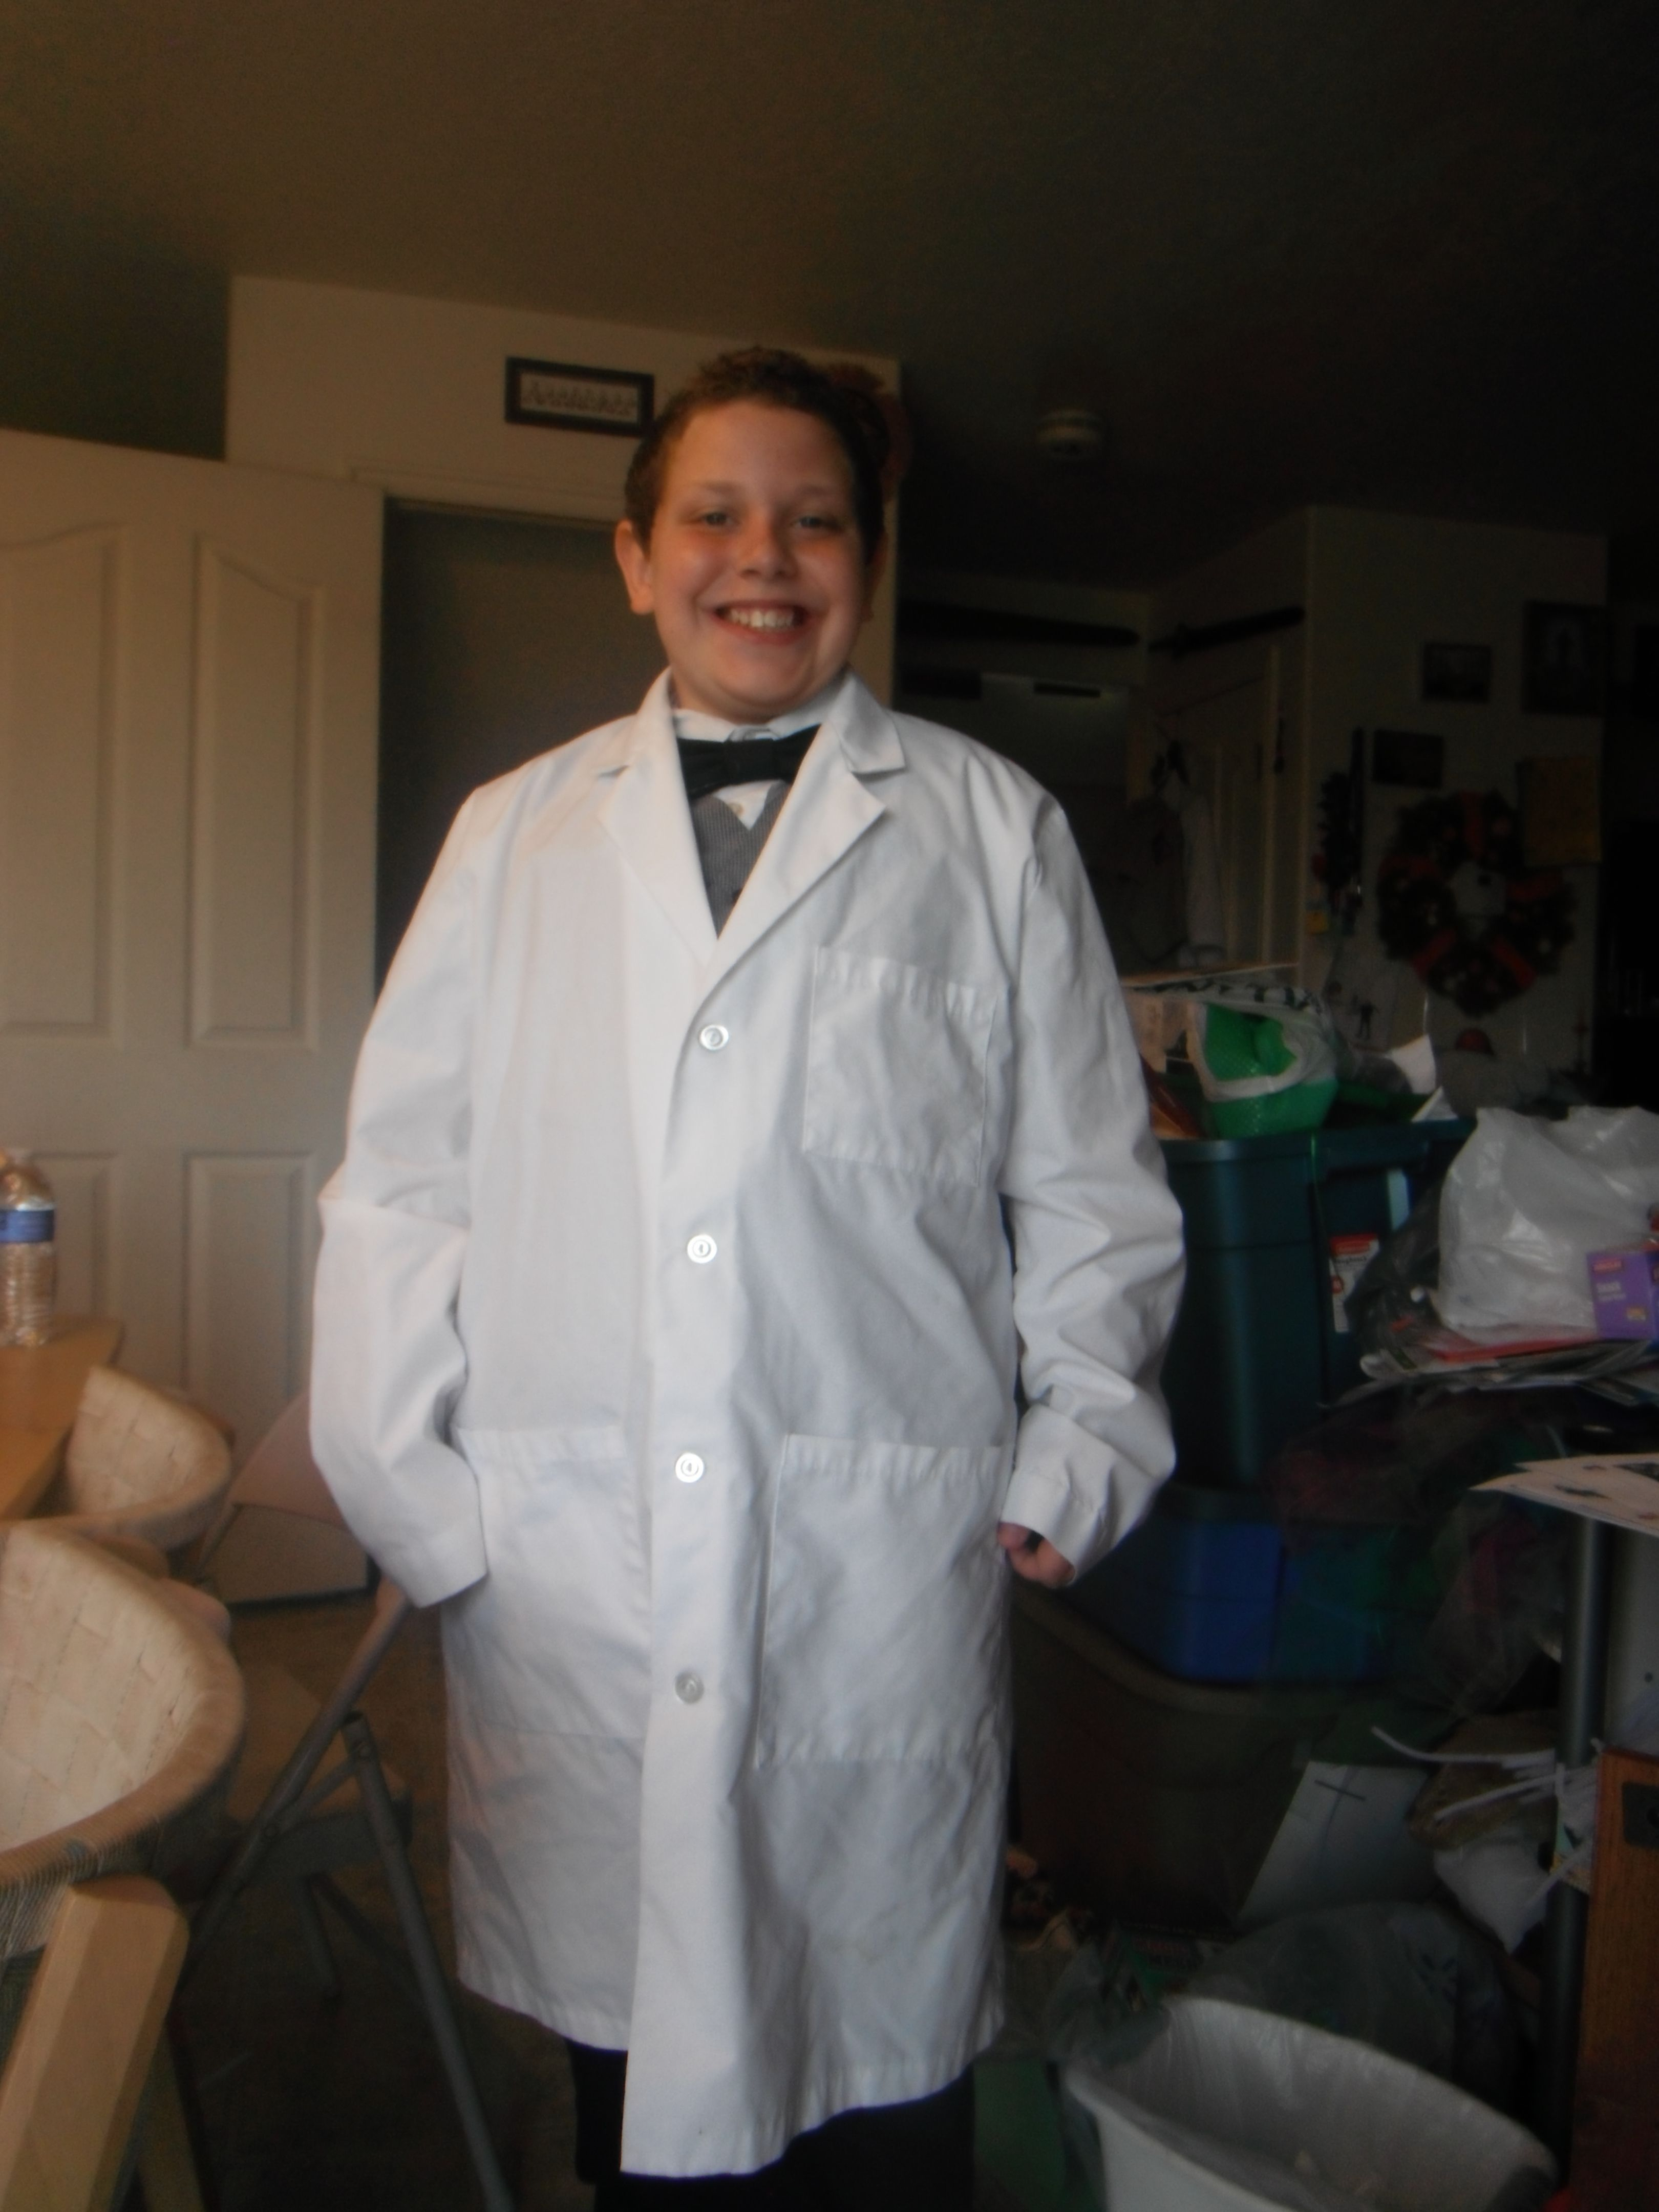 e1fe0827cedb Thomas Edison outfit, lab coat, homemade bow tie, vest & dress pants &  white shirt